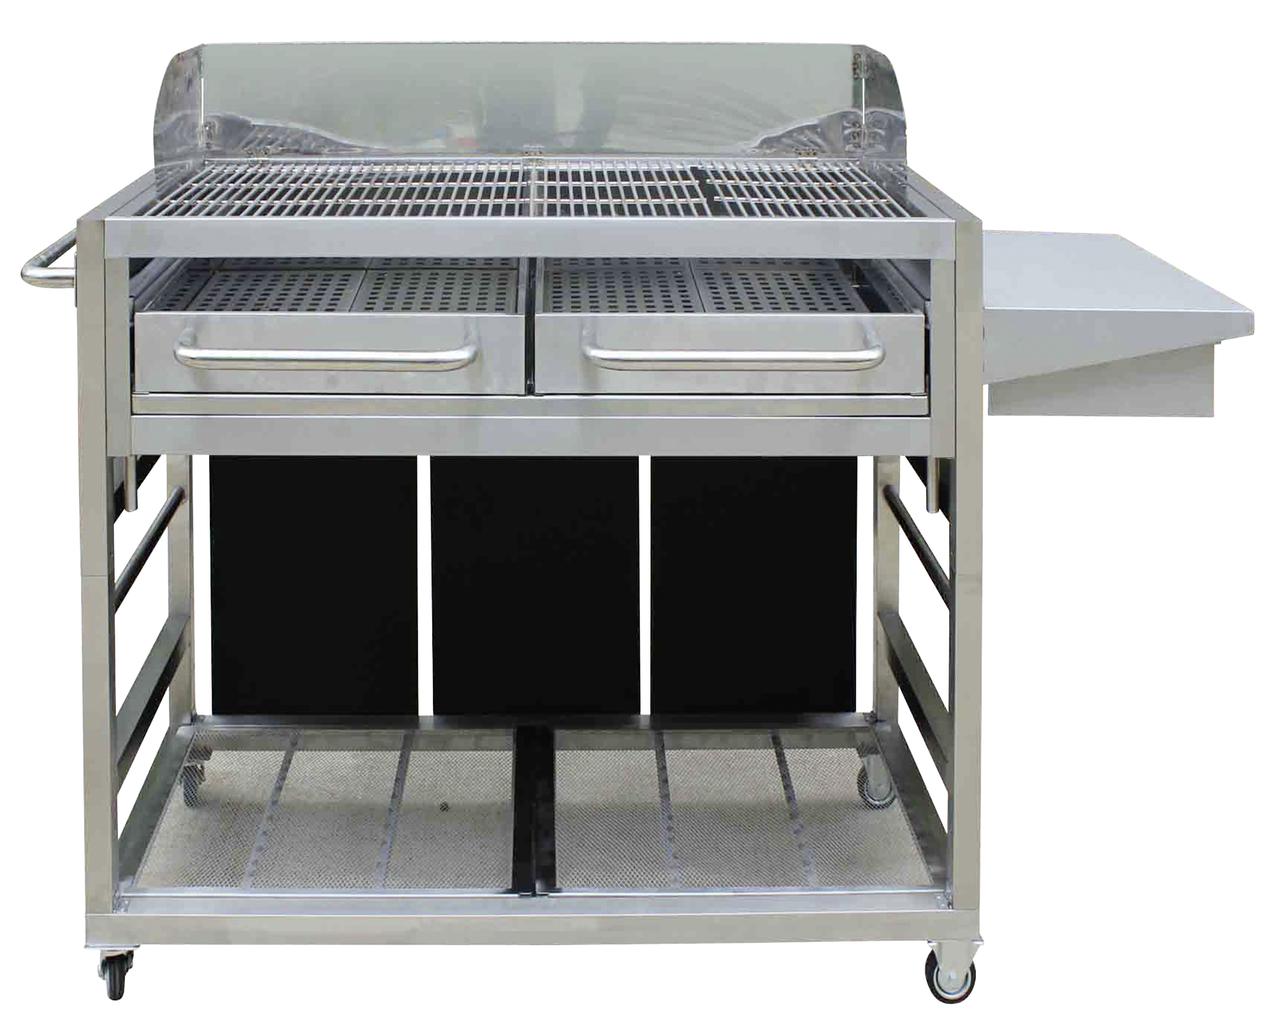 Weber Xxl Holzkohlegrill : Gastronomie grill xxl edelstahl holzkohlegrills grillen